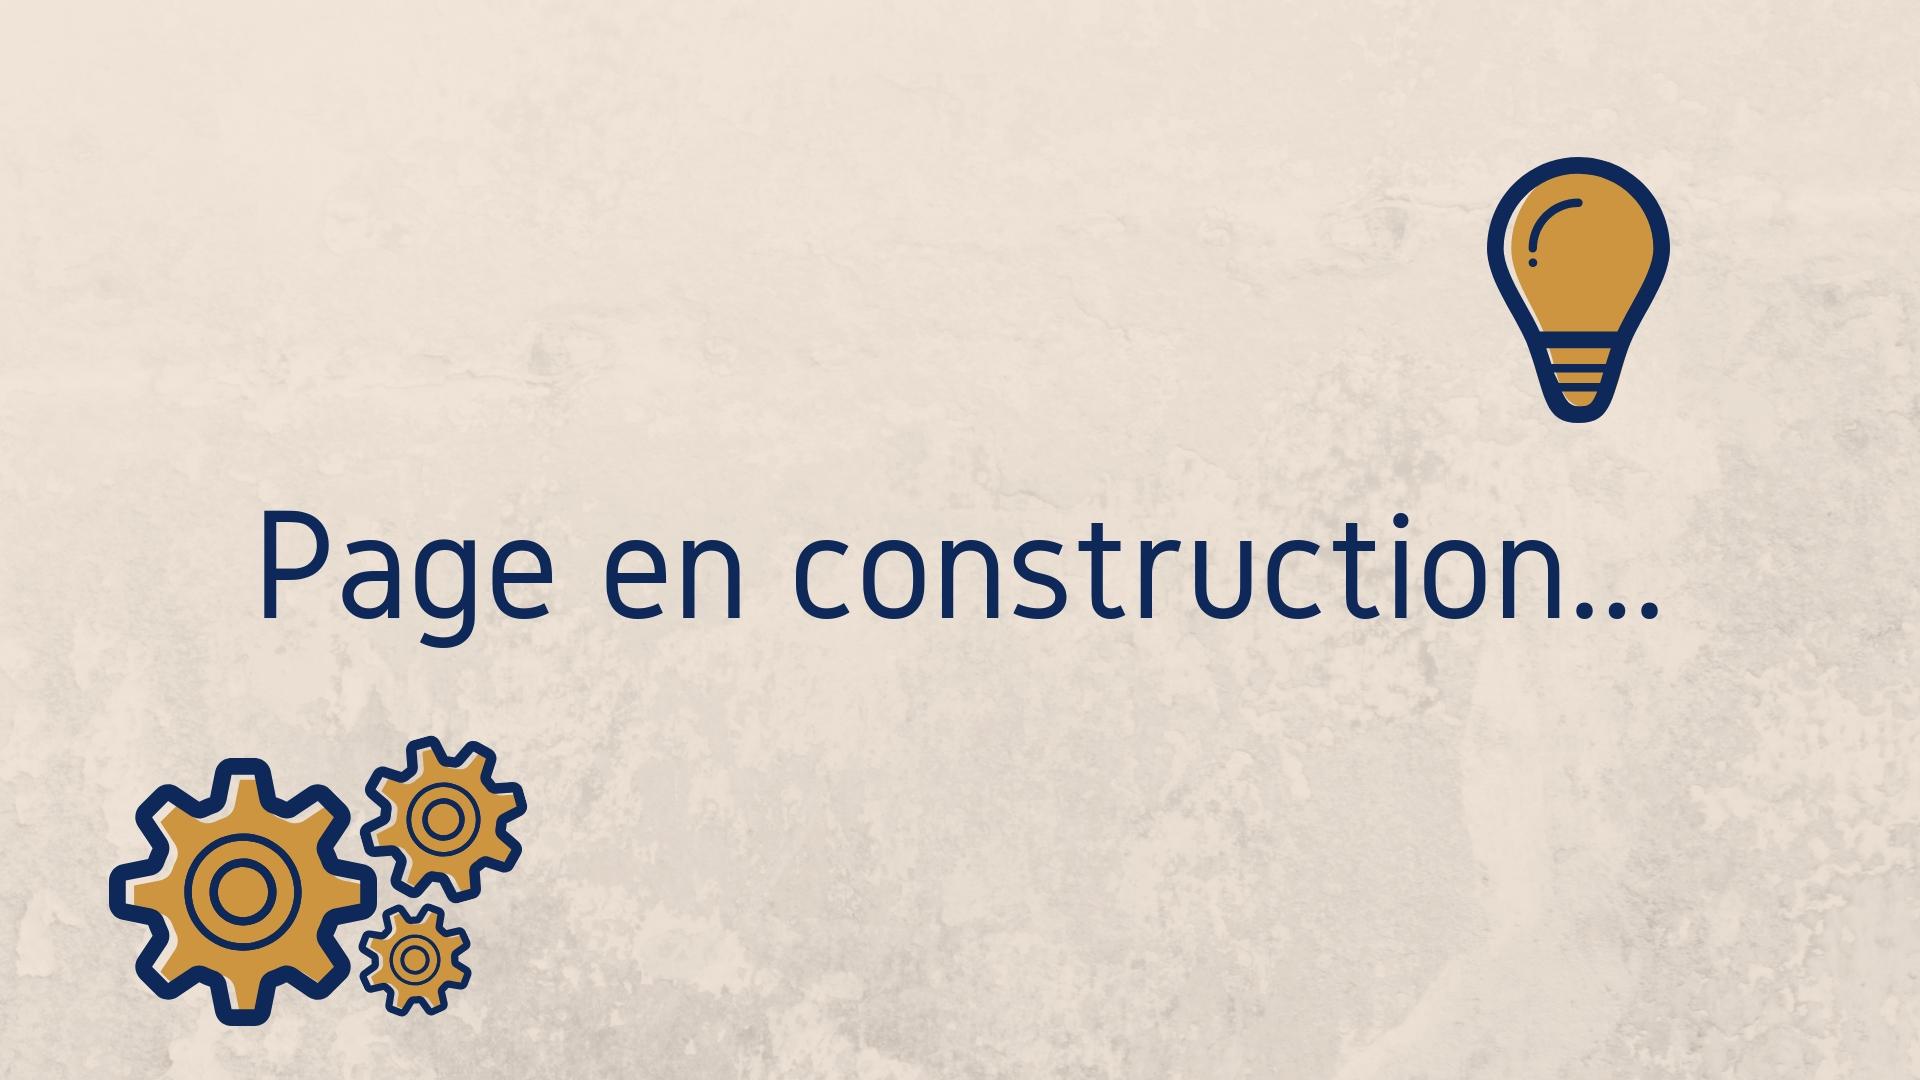 page-en-construction...